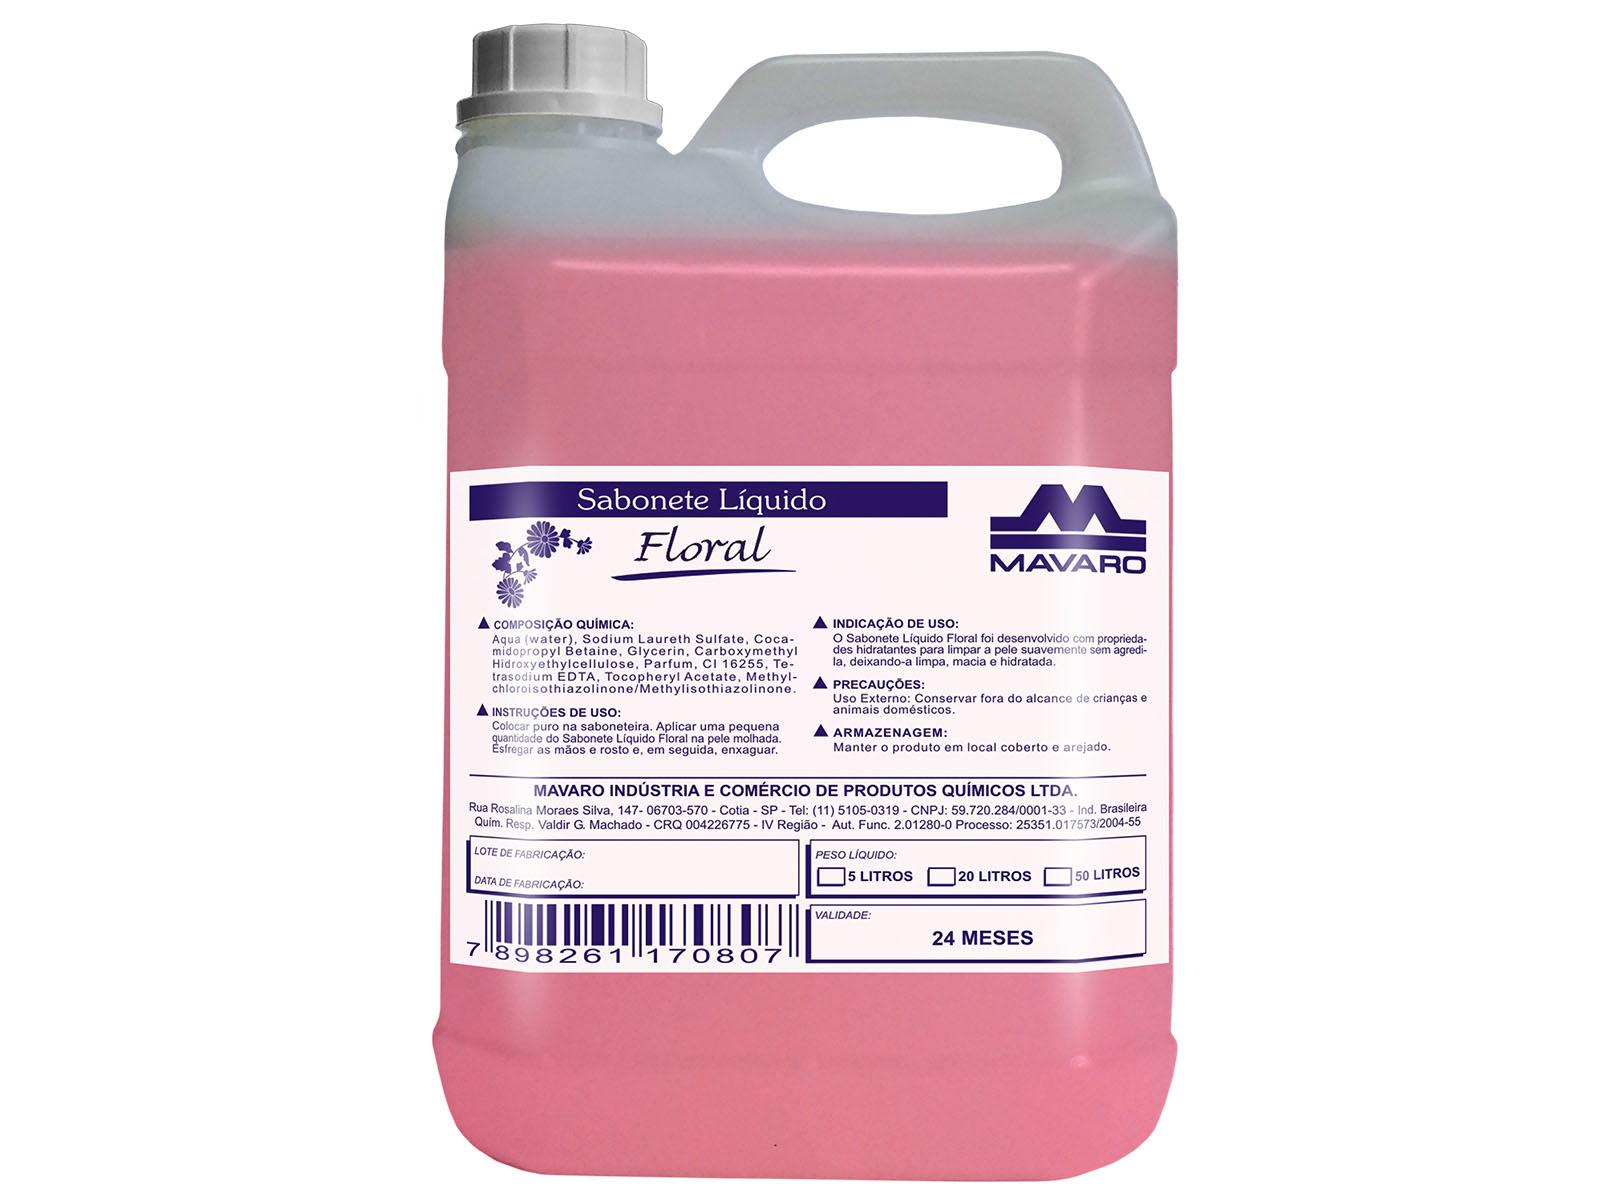 Sabonete líquido - Floral